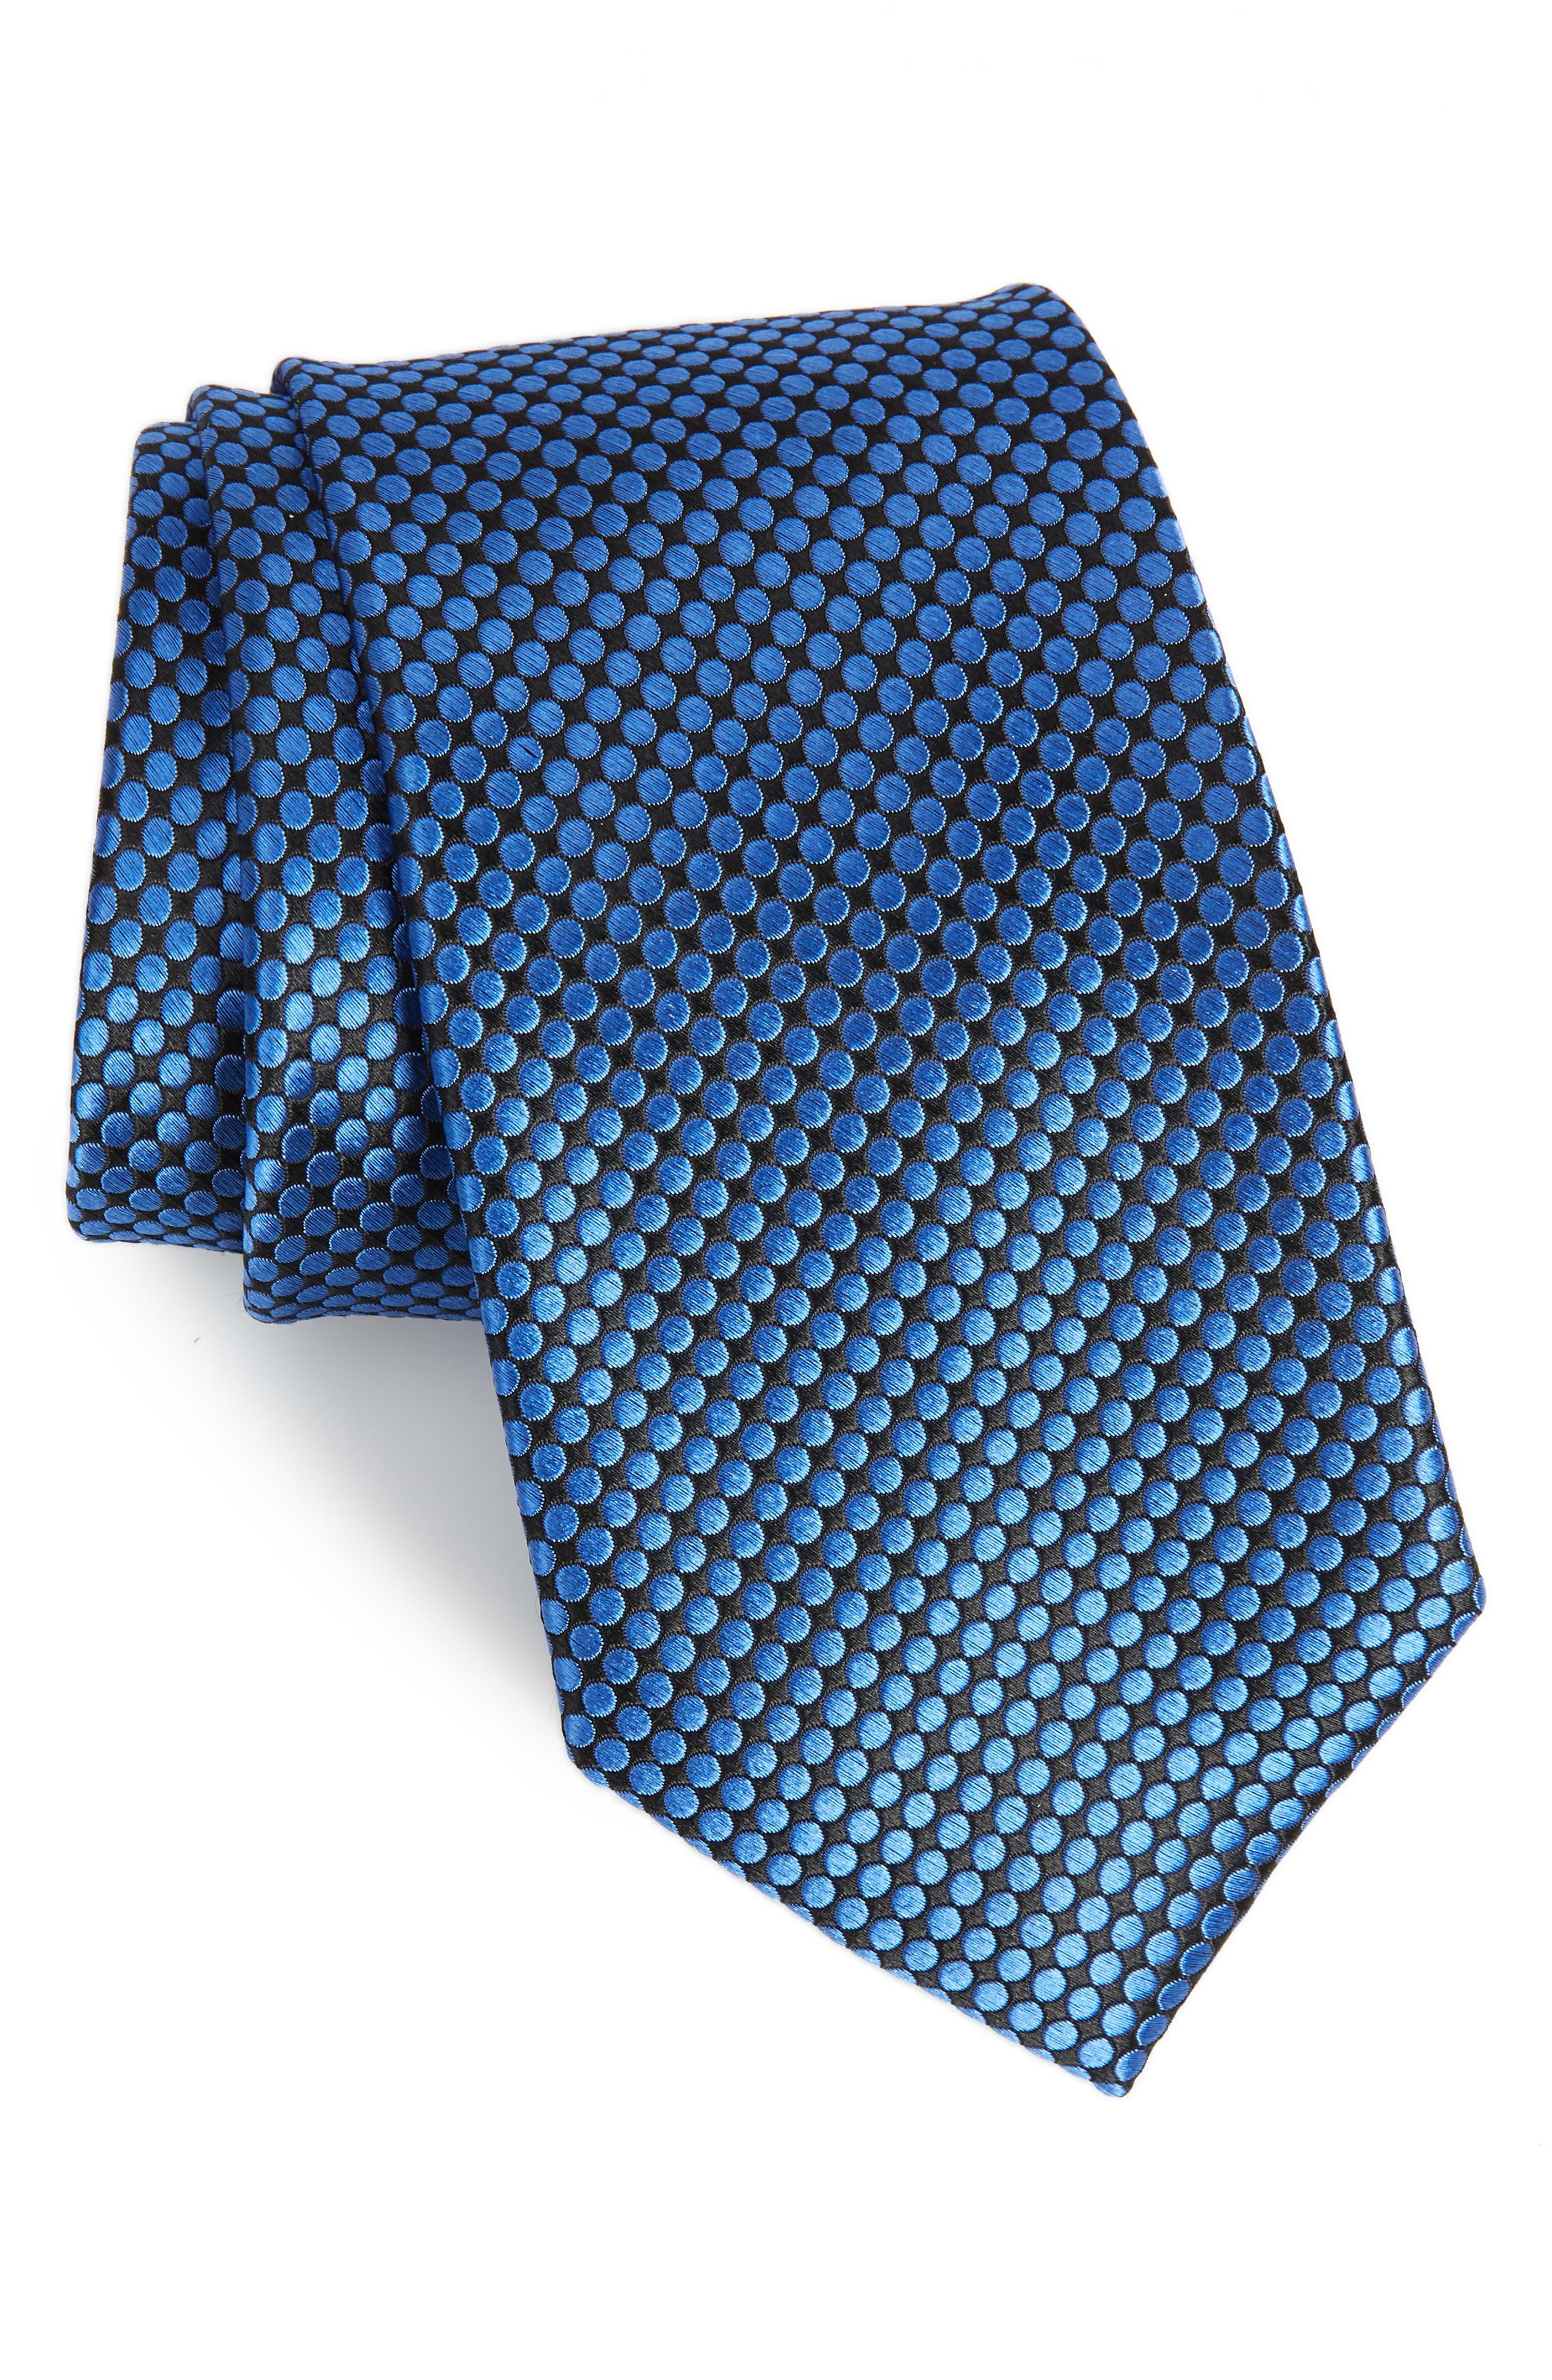 London Dot Silk Tie,                             Main thumbnail 1, color,                             SAPPHIRE